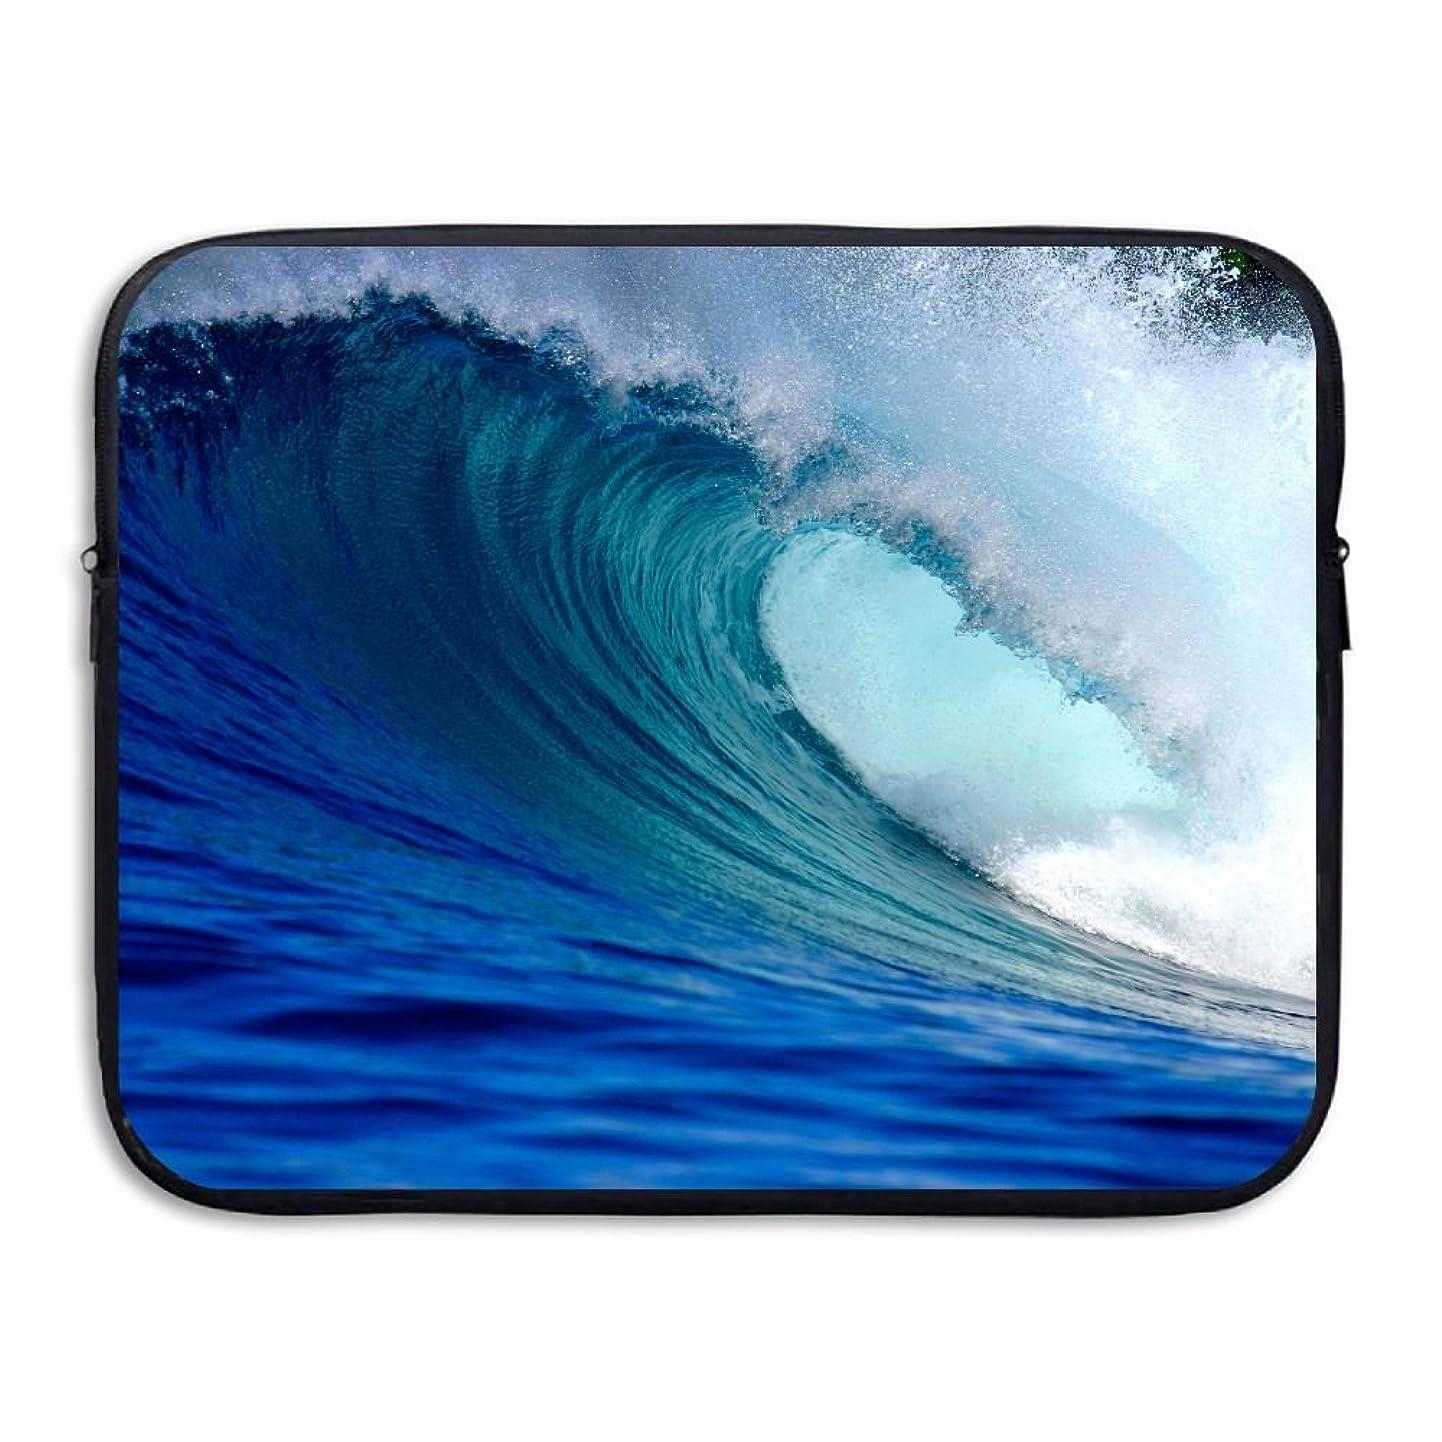 Sunmoonet Laptop Sleeve, Waves Blue 13 Inch 15 Inch Laptop Sleeve, Water Repellent Universal Portable Computer Liner Laptop Case Laptop Sleeves Notebook Bag Cover For Women Men gxcoehosgpr1